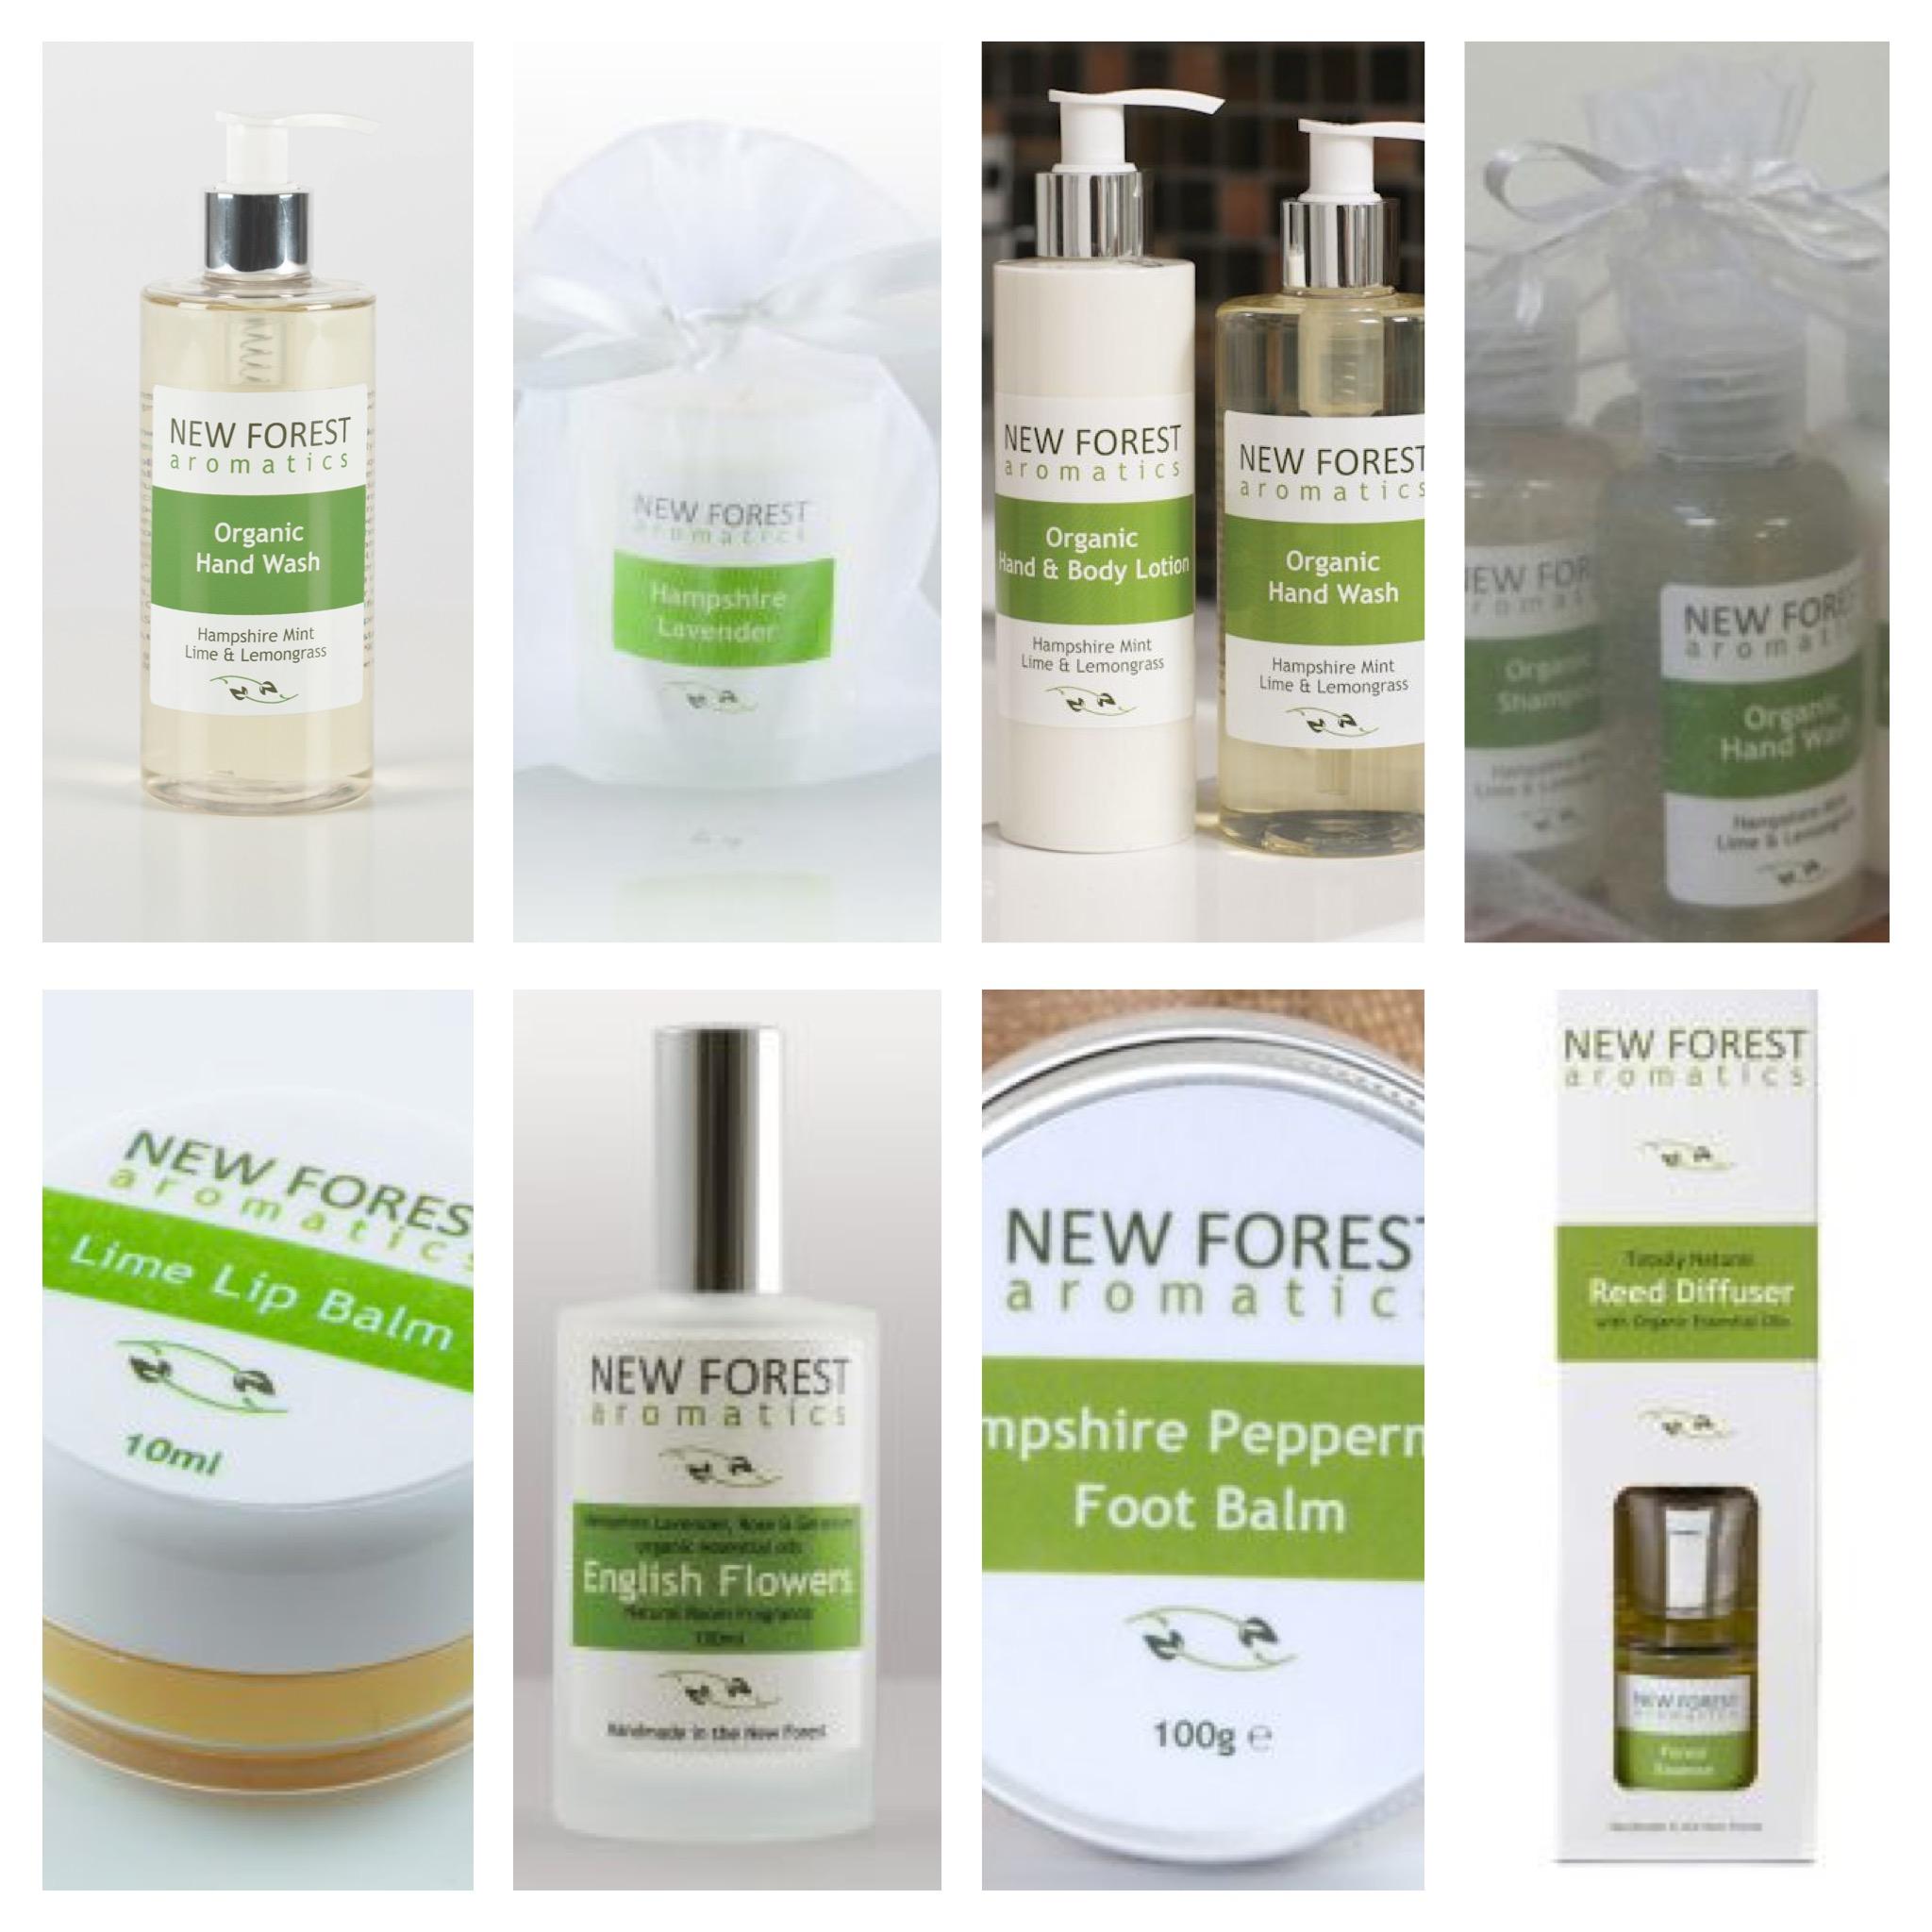 New Forest Aromatics